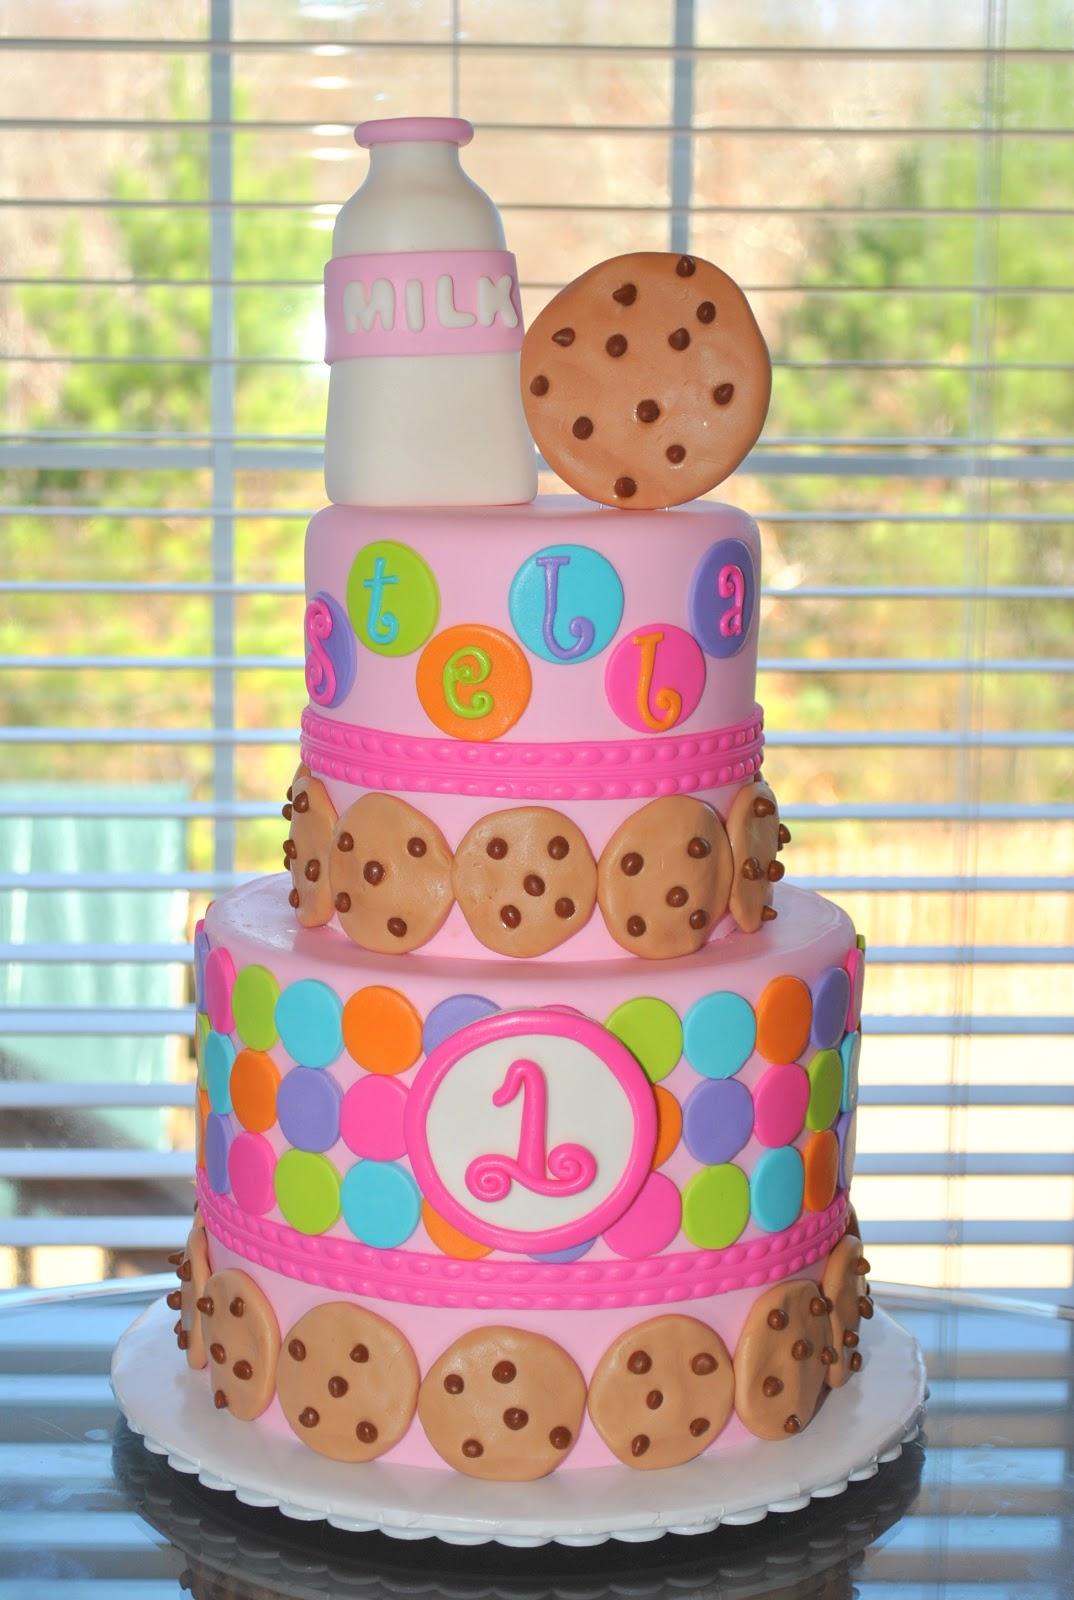 Hope S Sweet Cakes December 2012